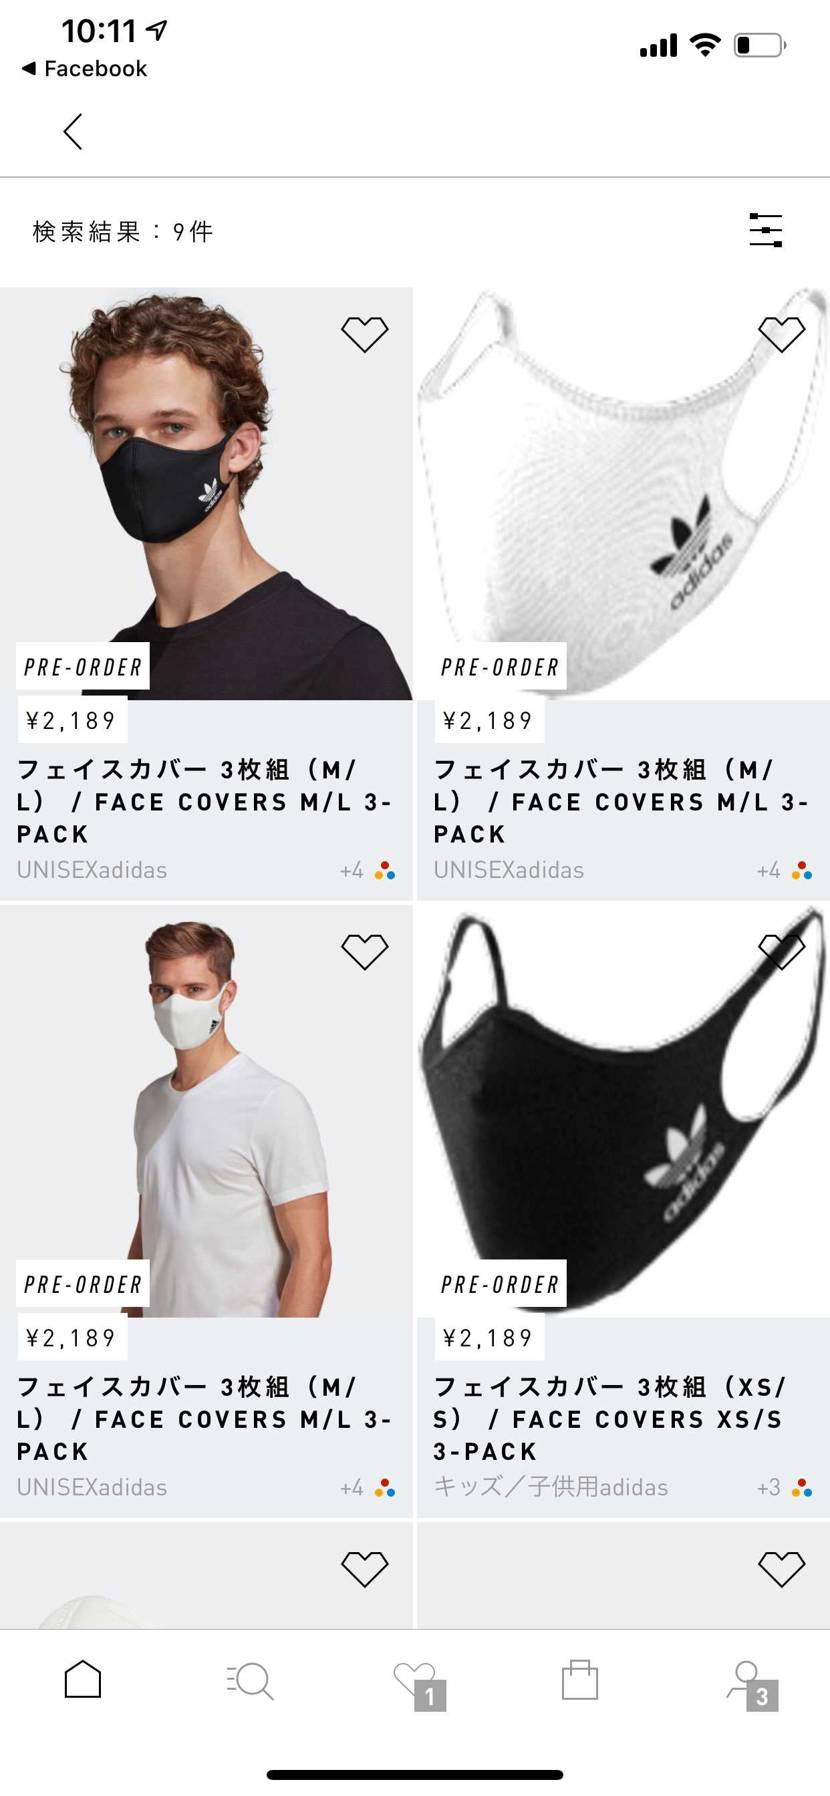 Adidasマスクの予約